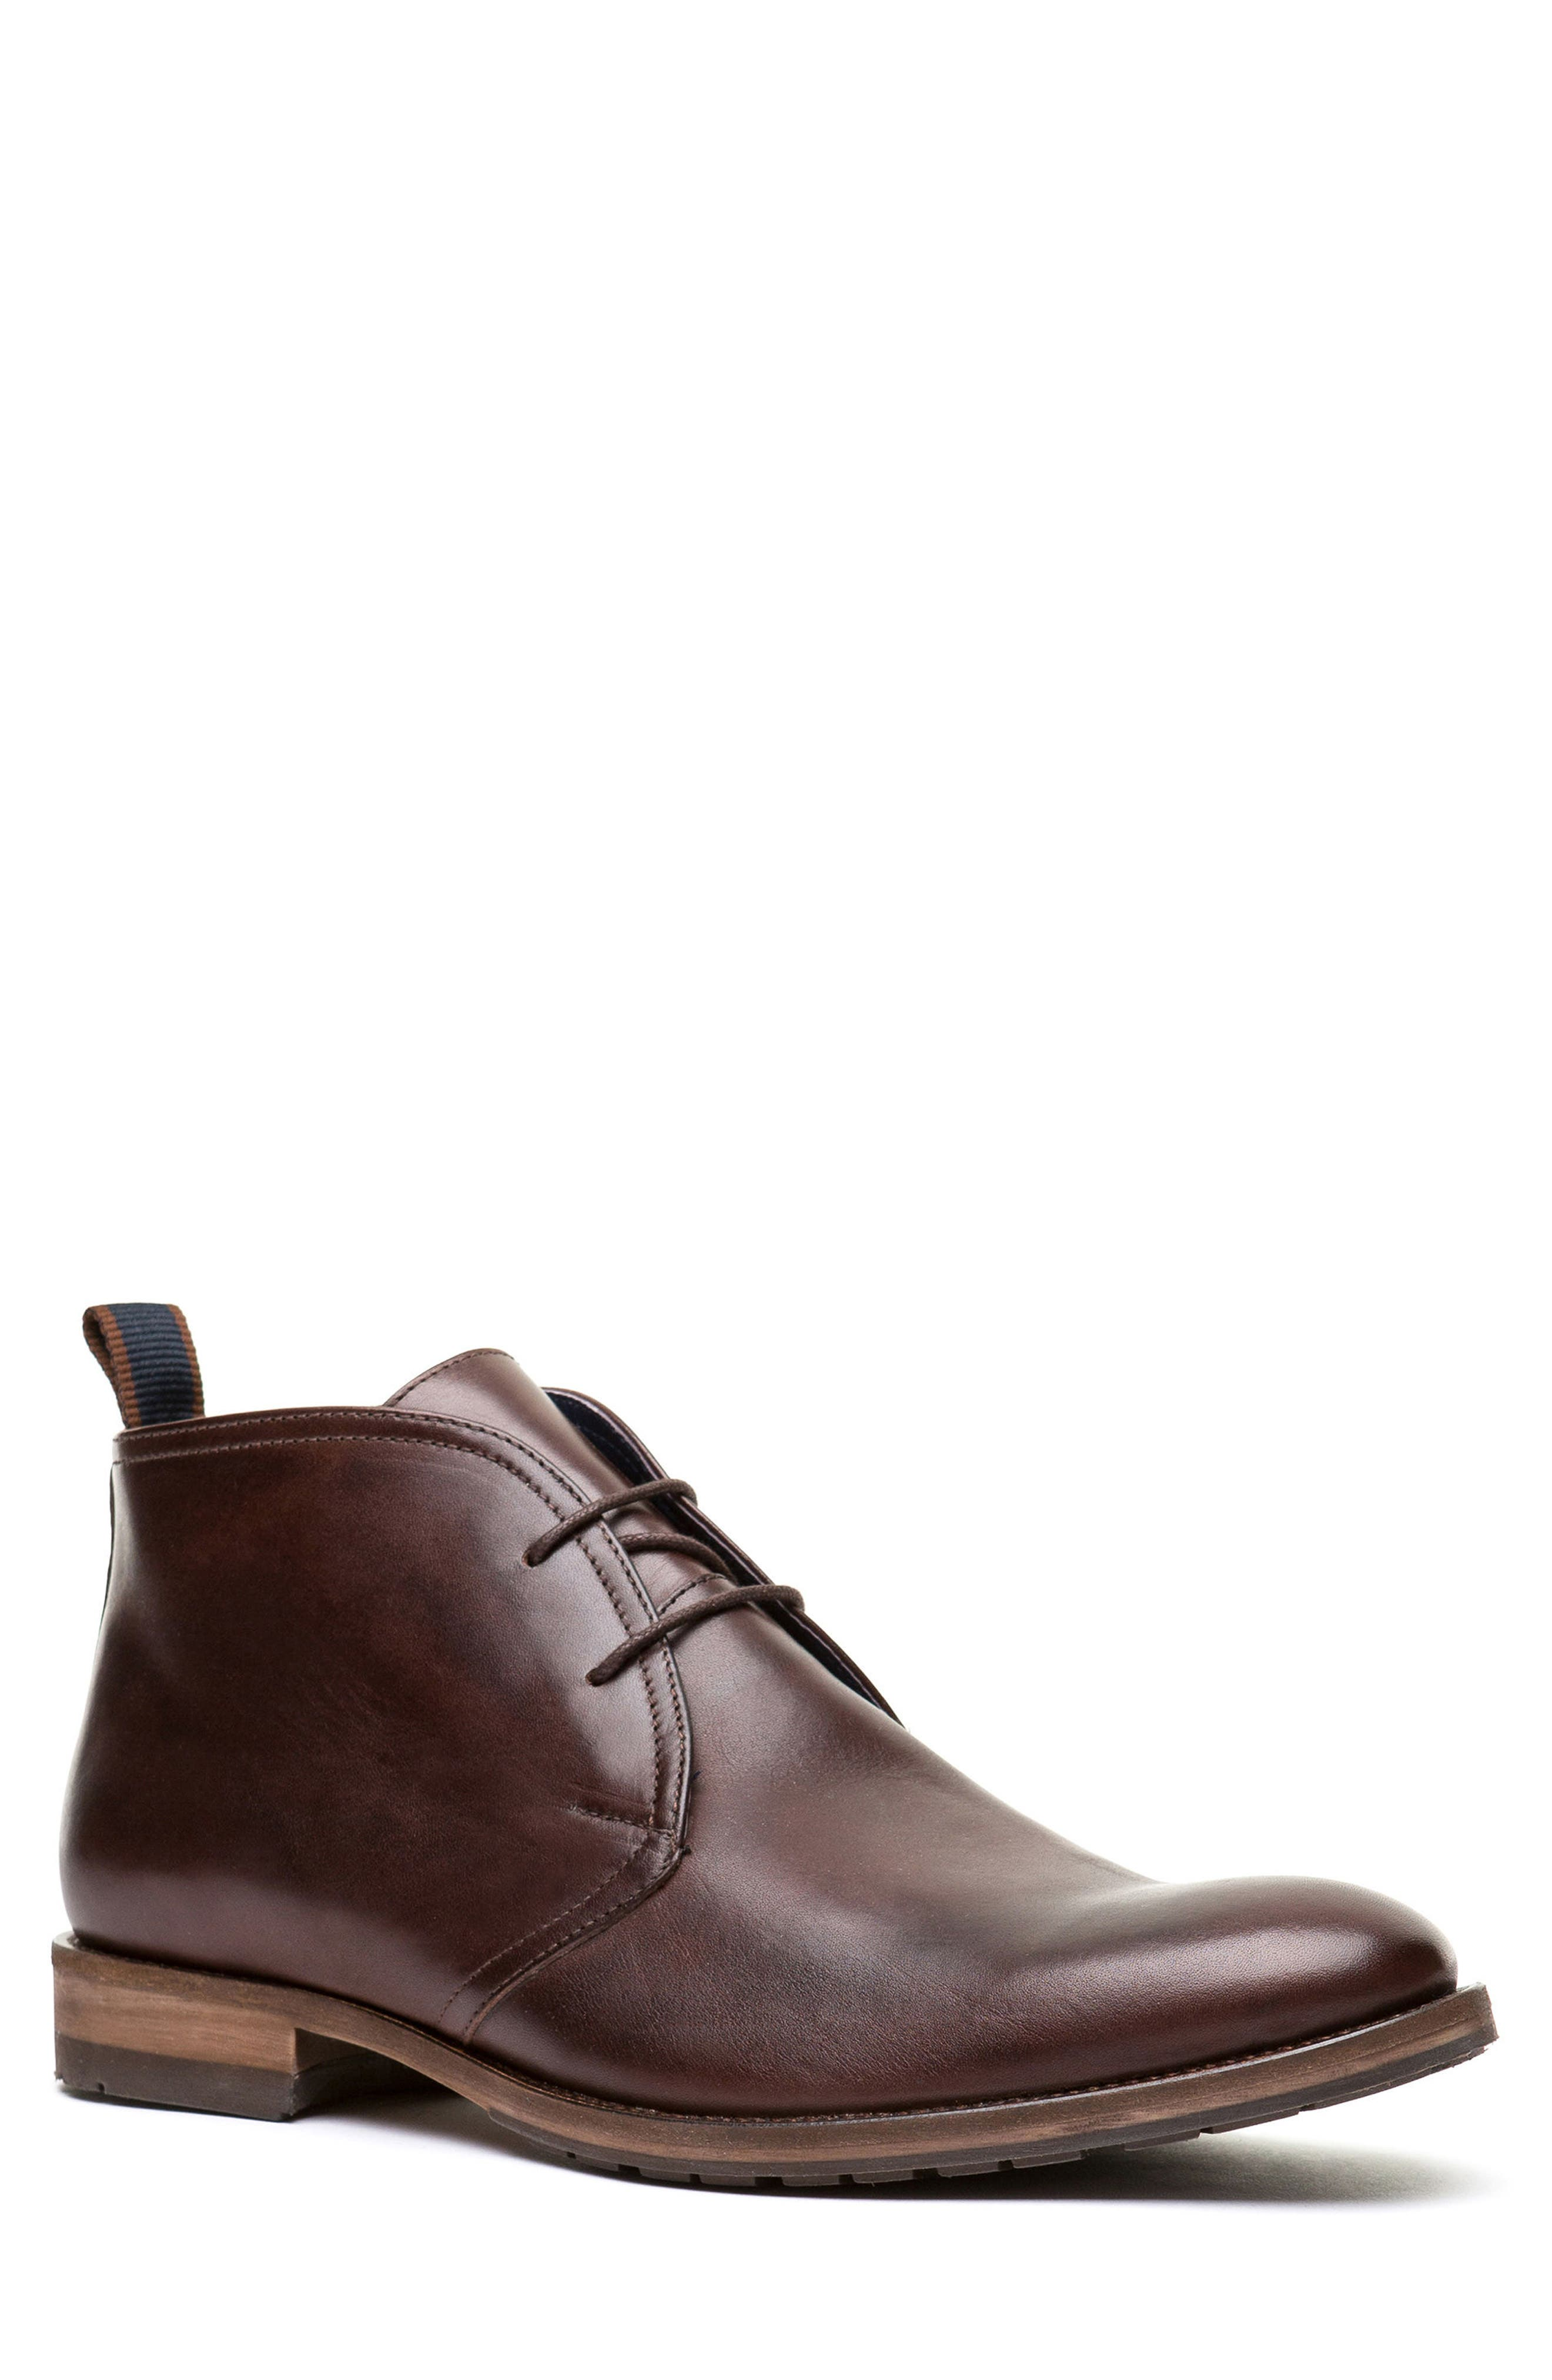 Main Image - Rodd & Gunn Pebbly Hill Chukka Boot (Men)